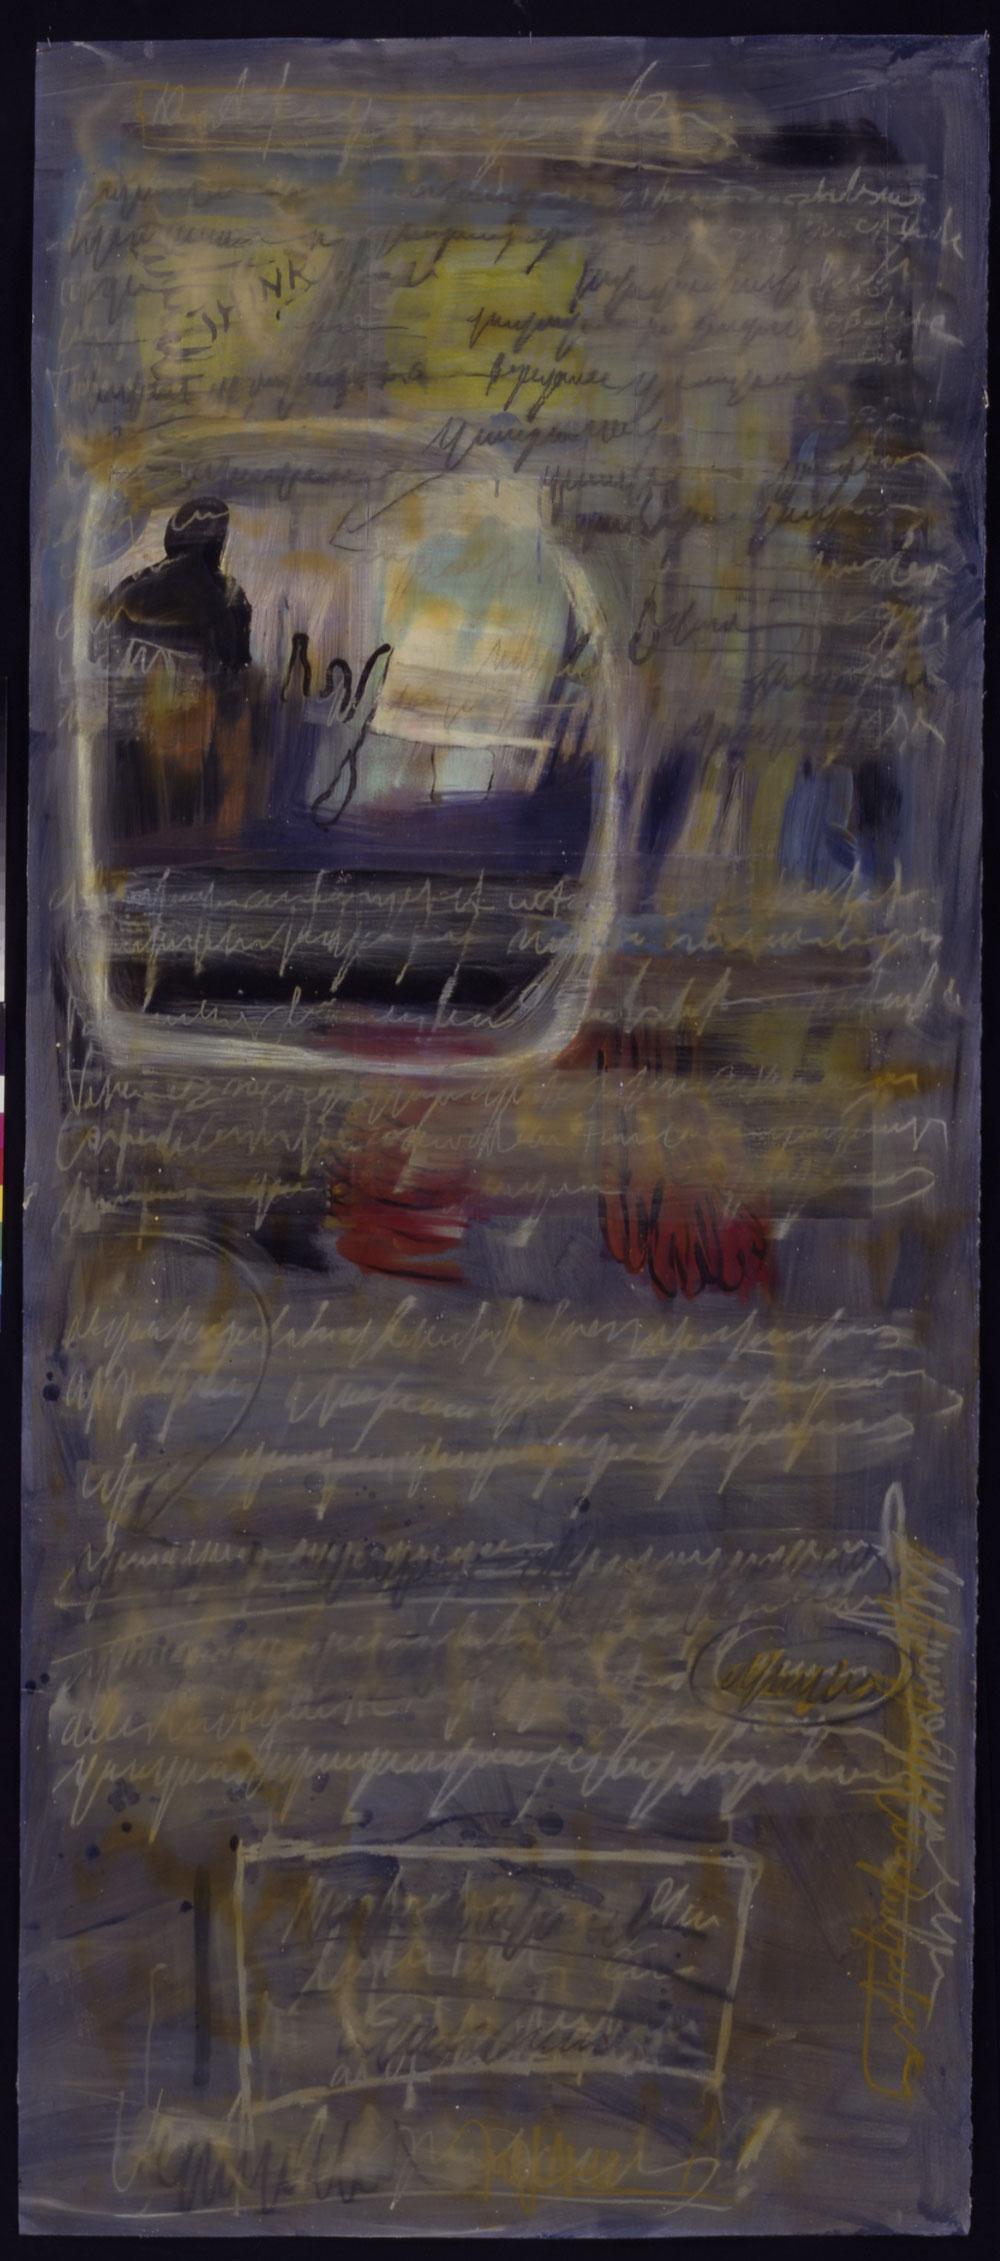 """Der Anfang"", 230 x 100 cm, Mischtechnik auf Aquarellkarton, 2000"